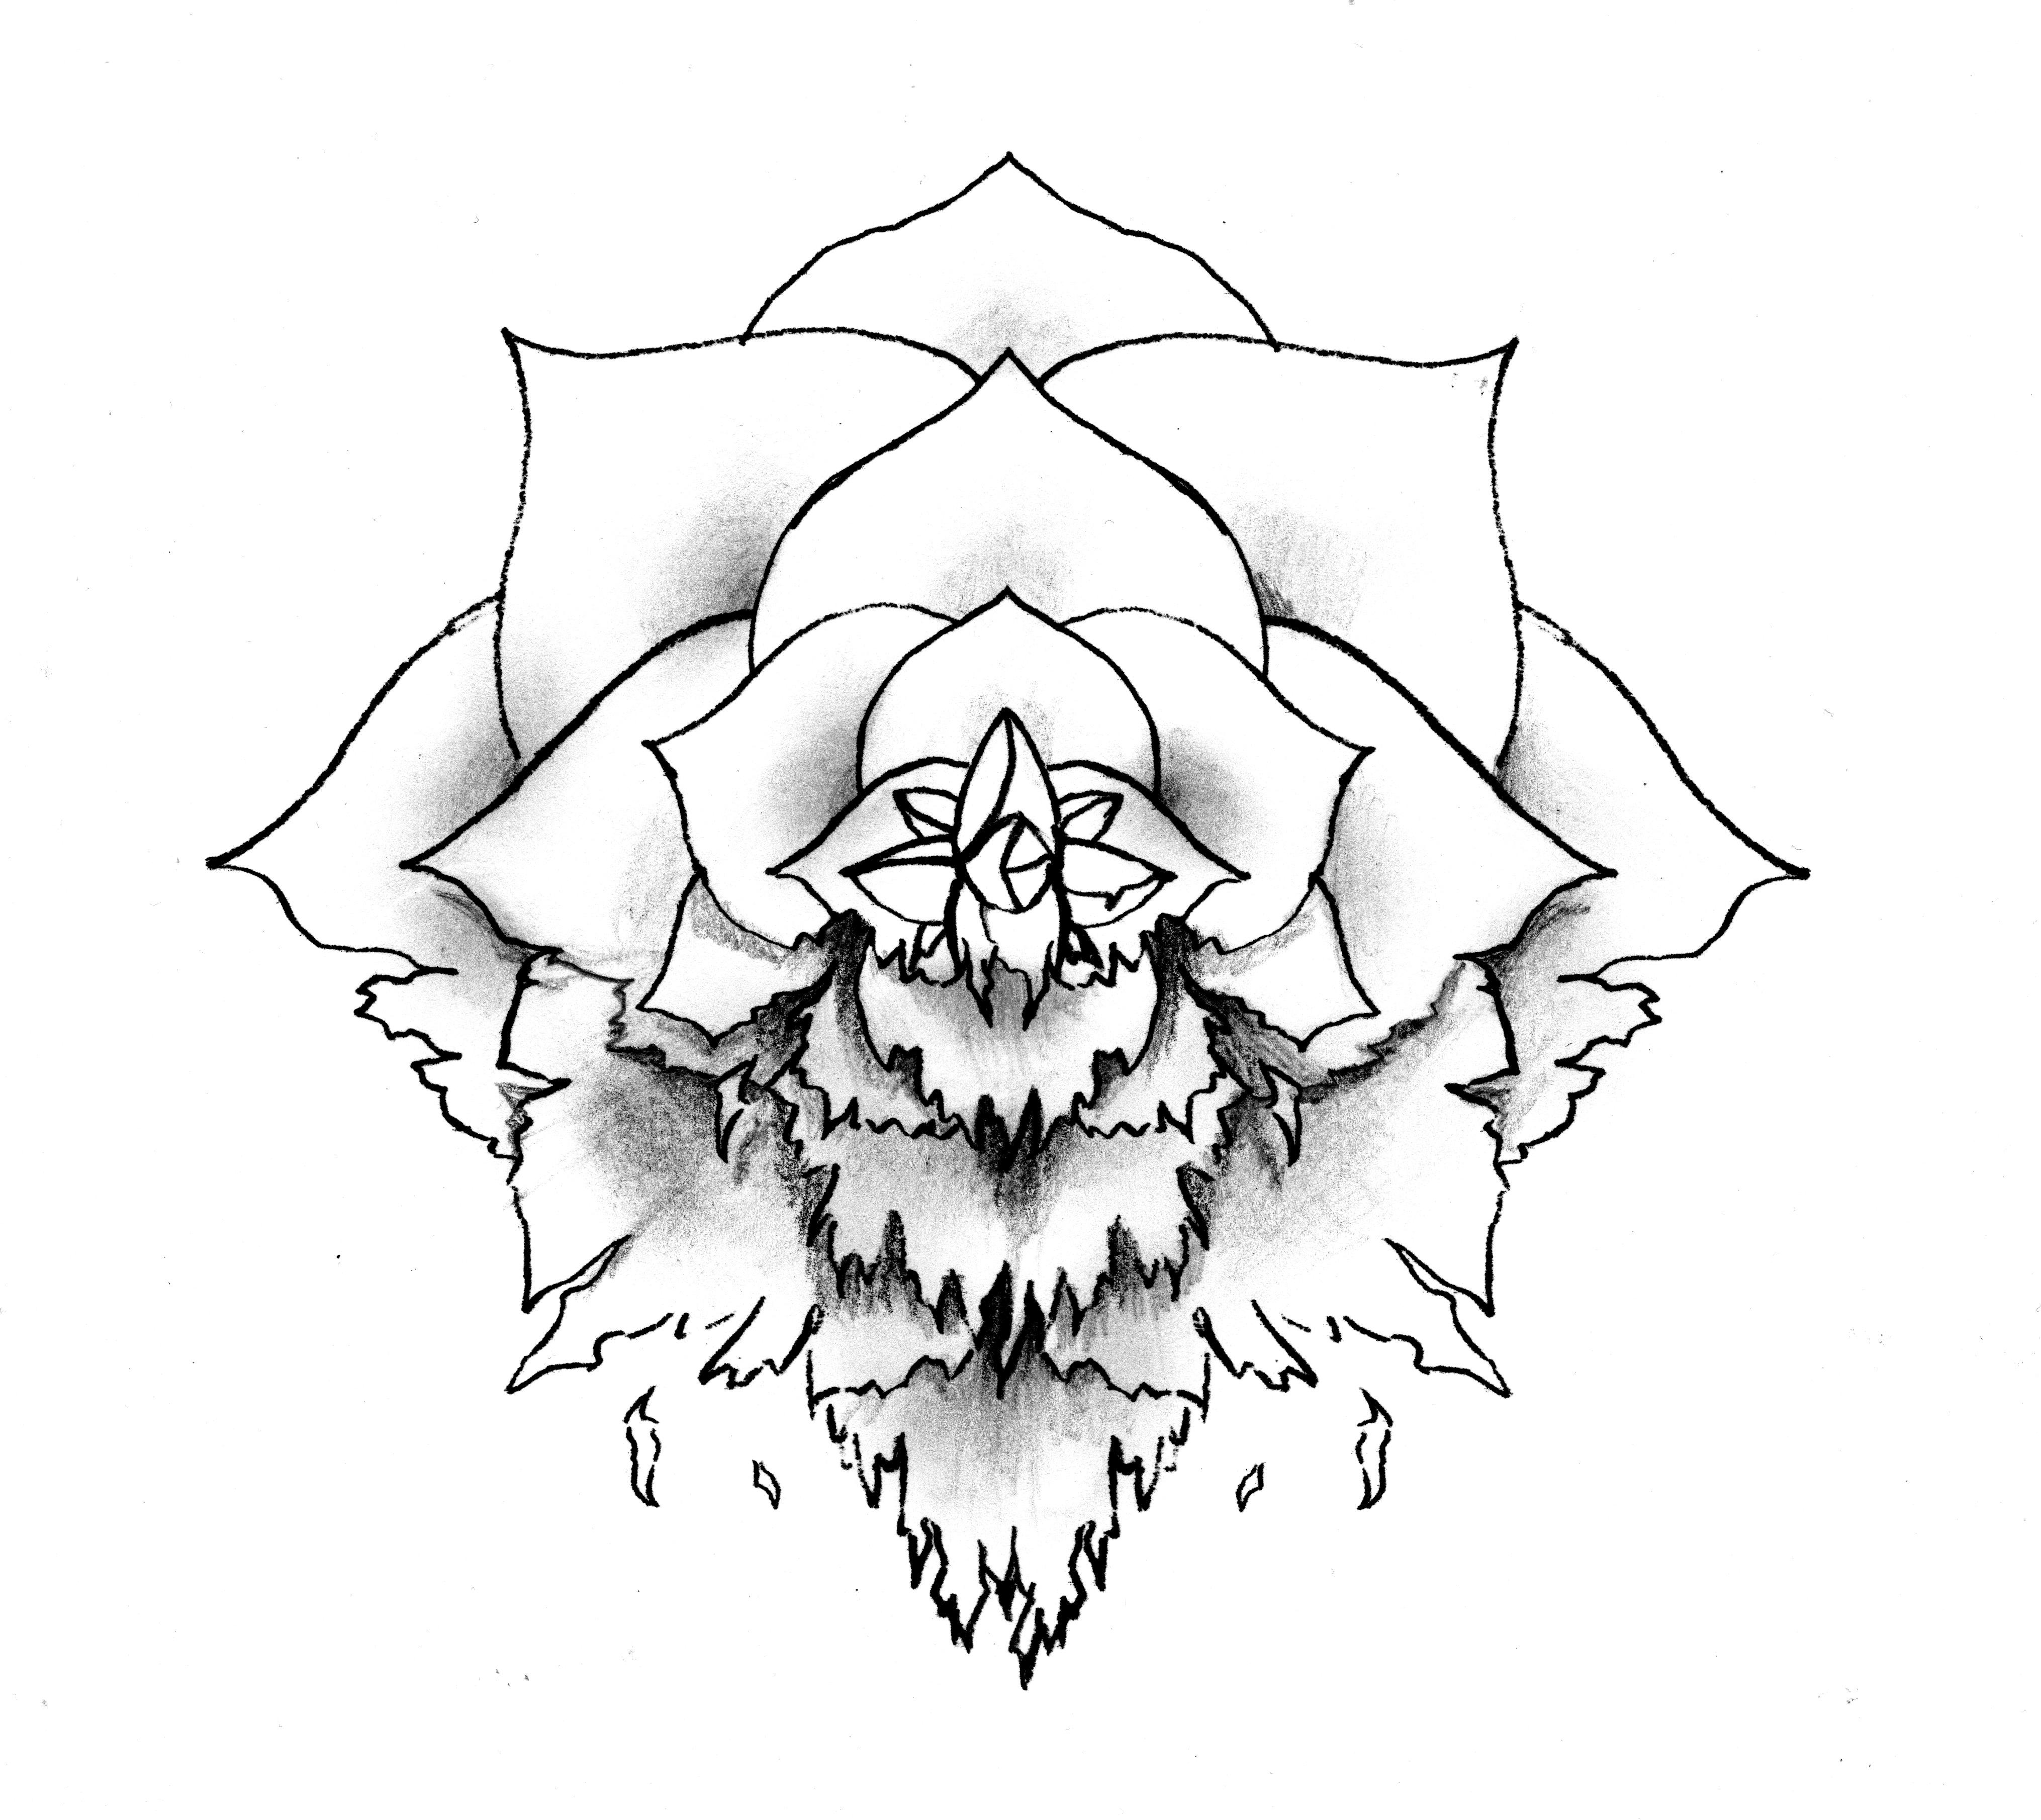 Line Art Design Trend : Attractive rose drawings design trends